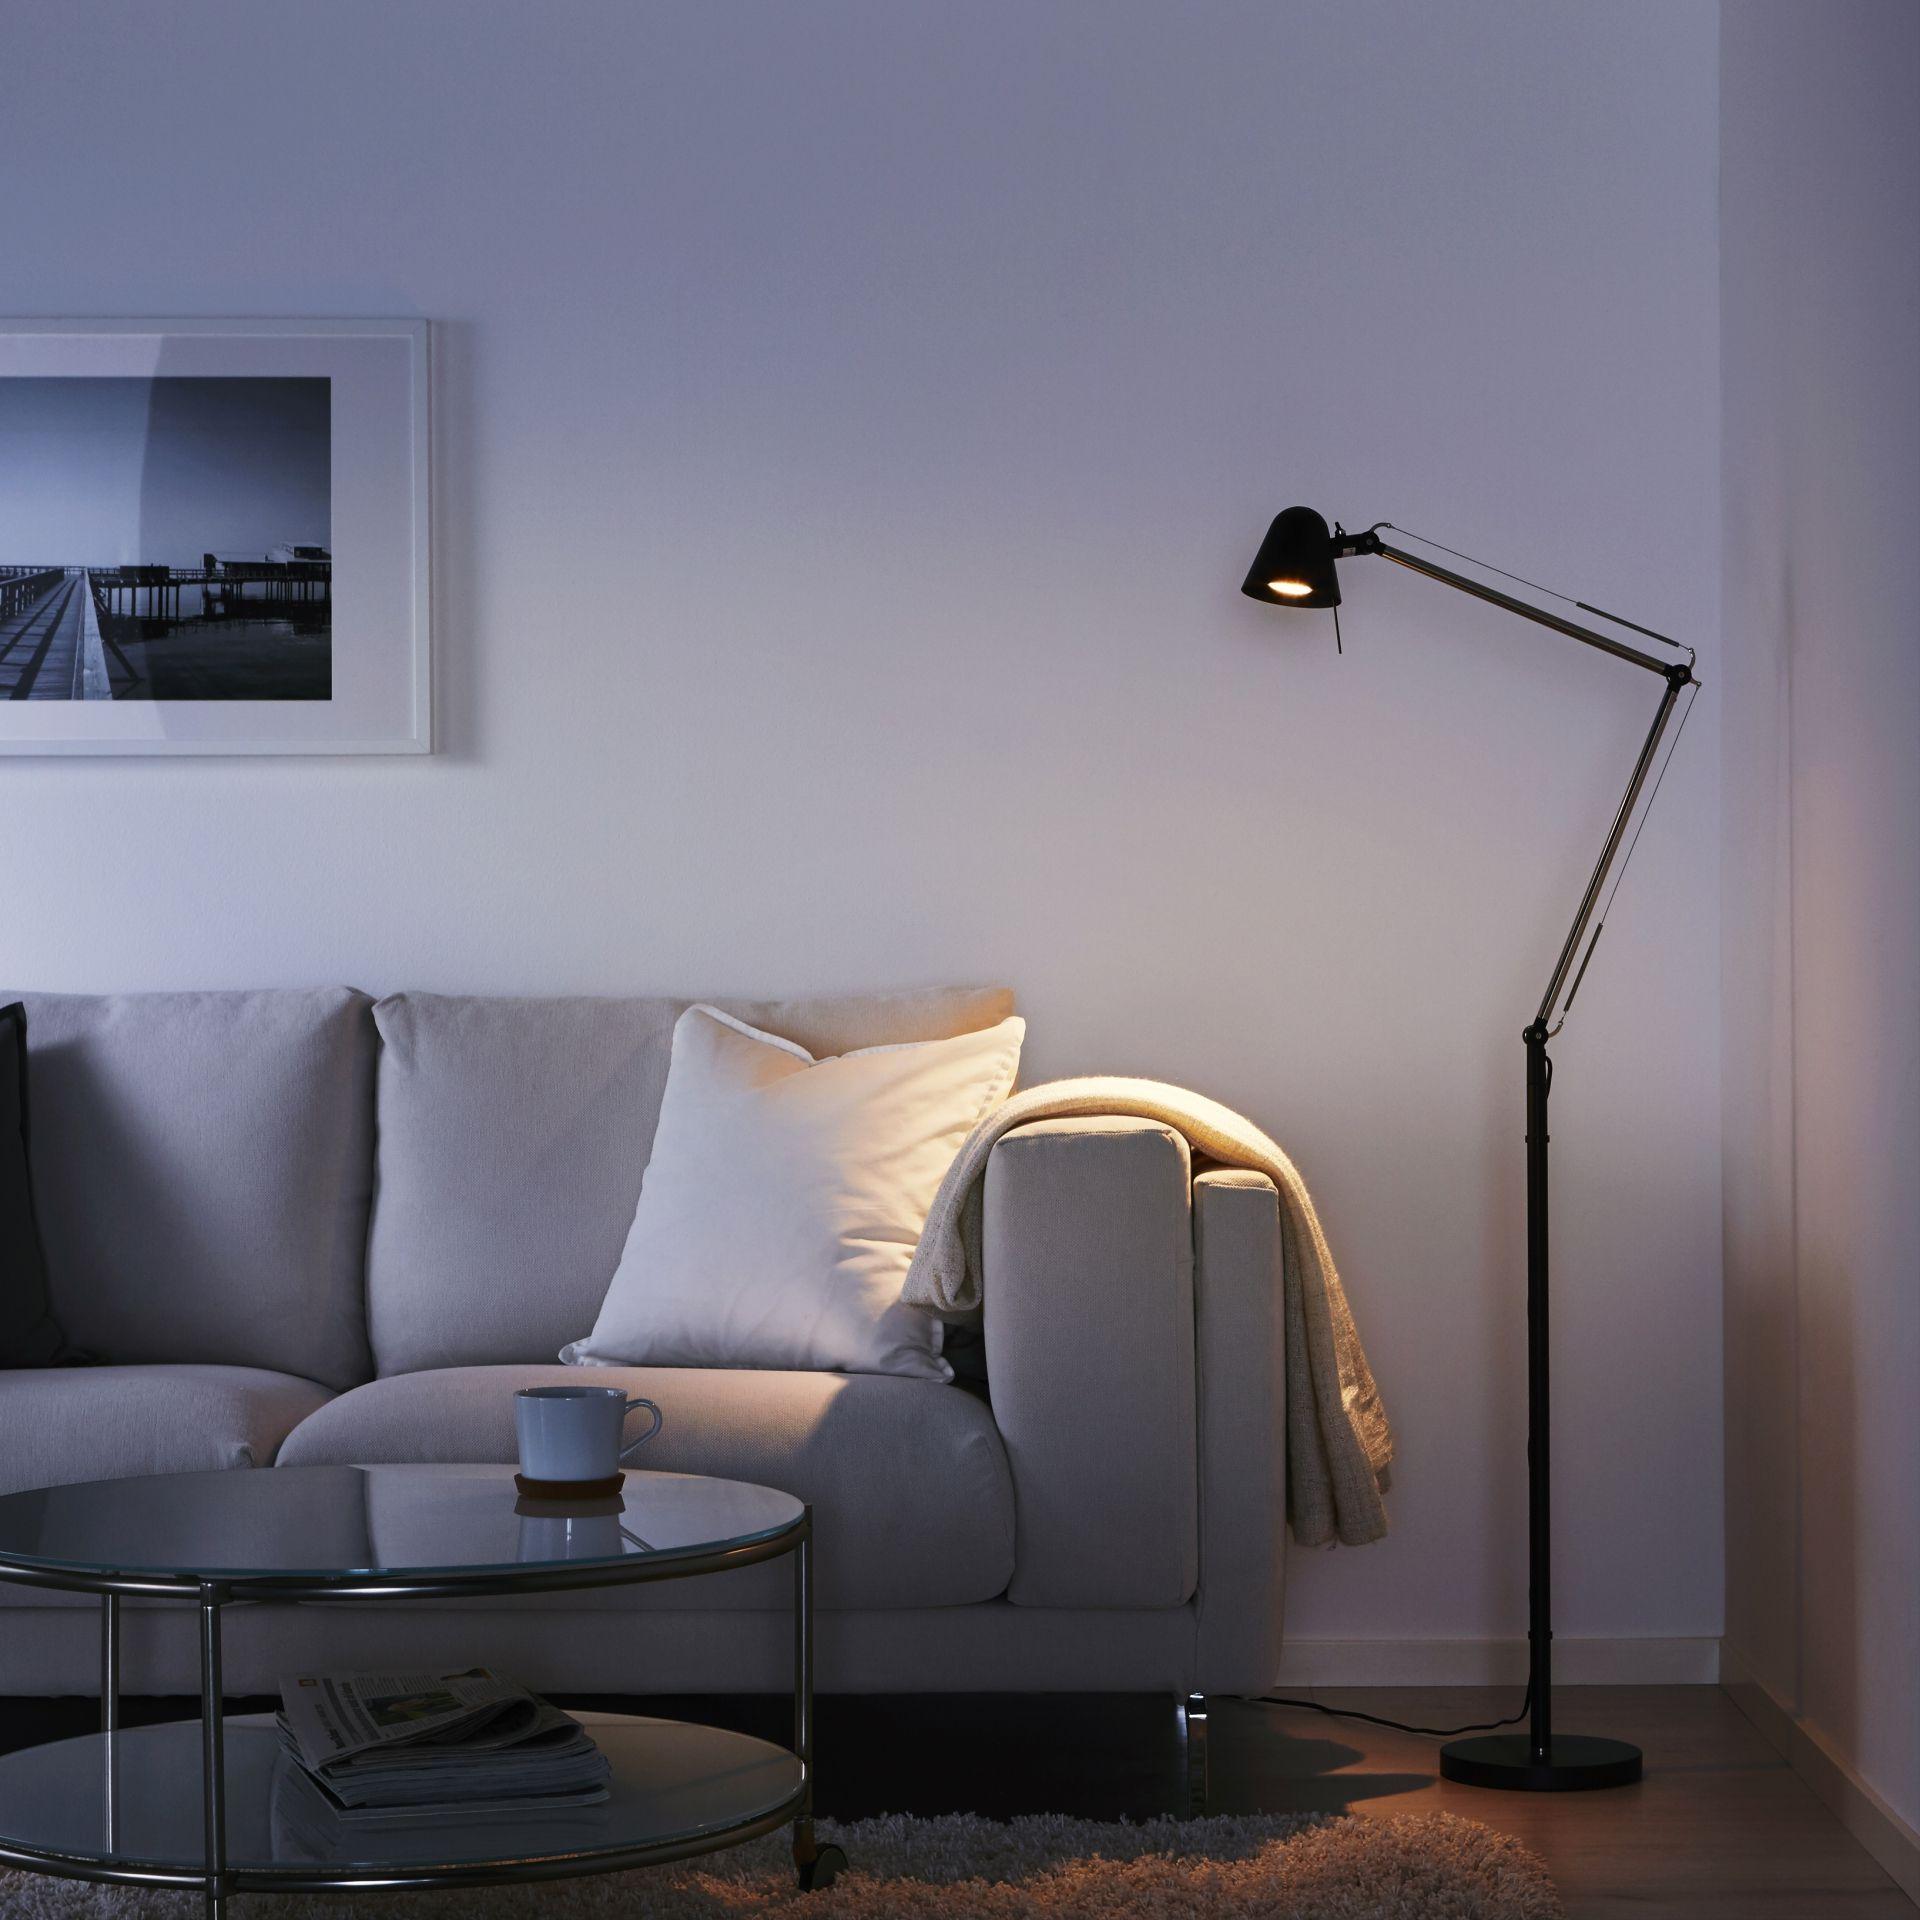 UPPBO staande/leeslamp | IKEA IKEAnl IKEAnederland designdroom ...